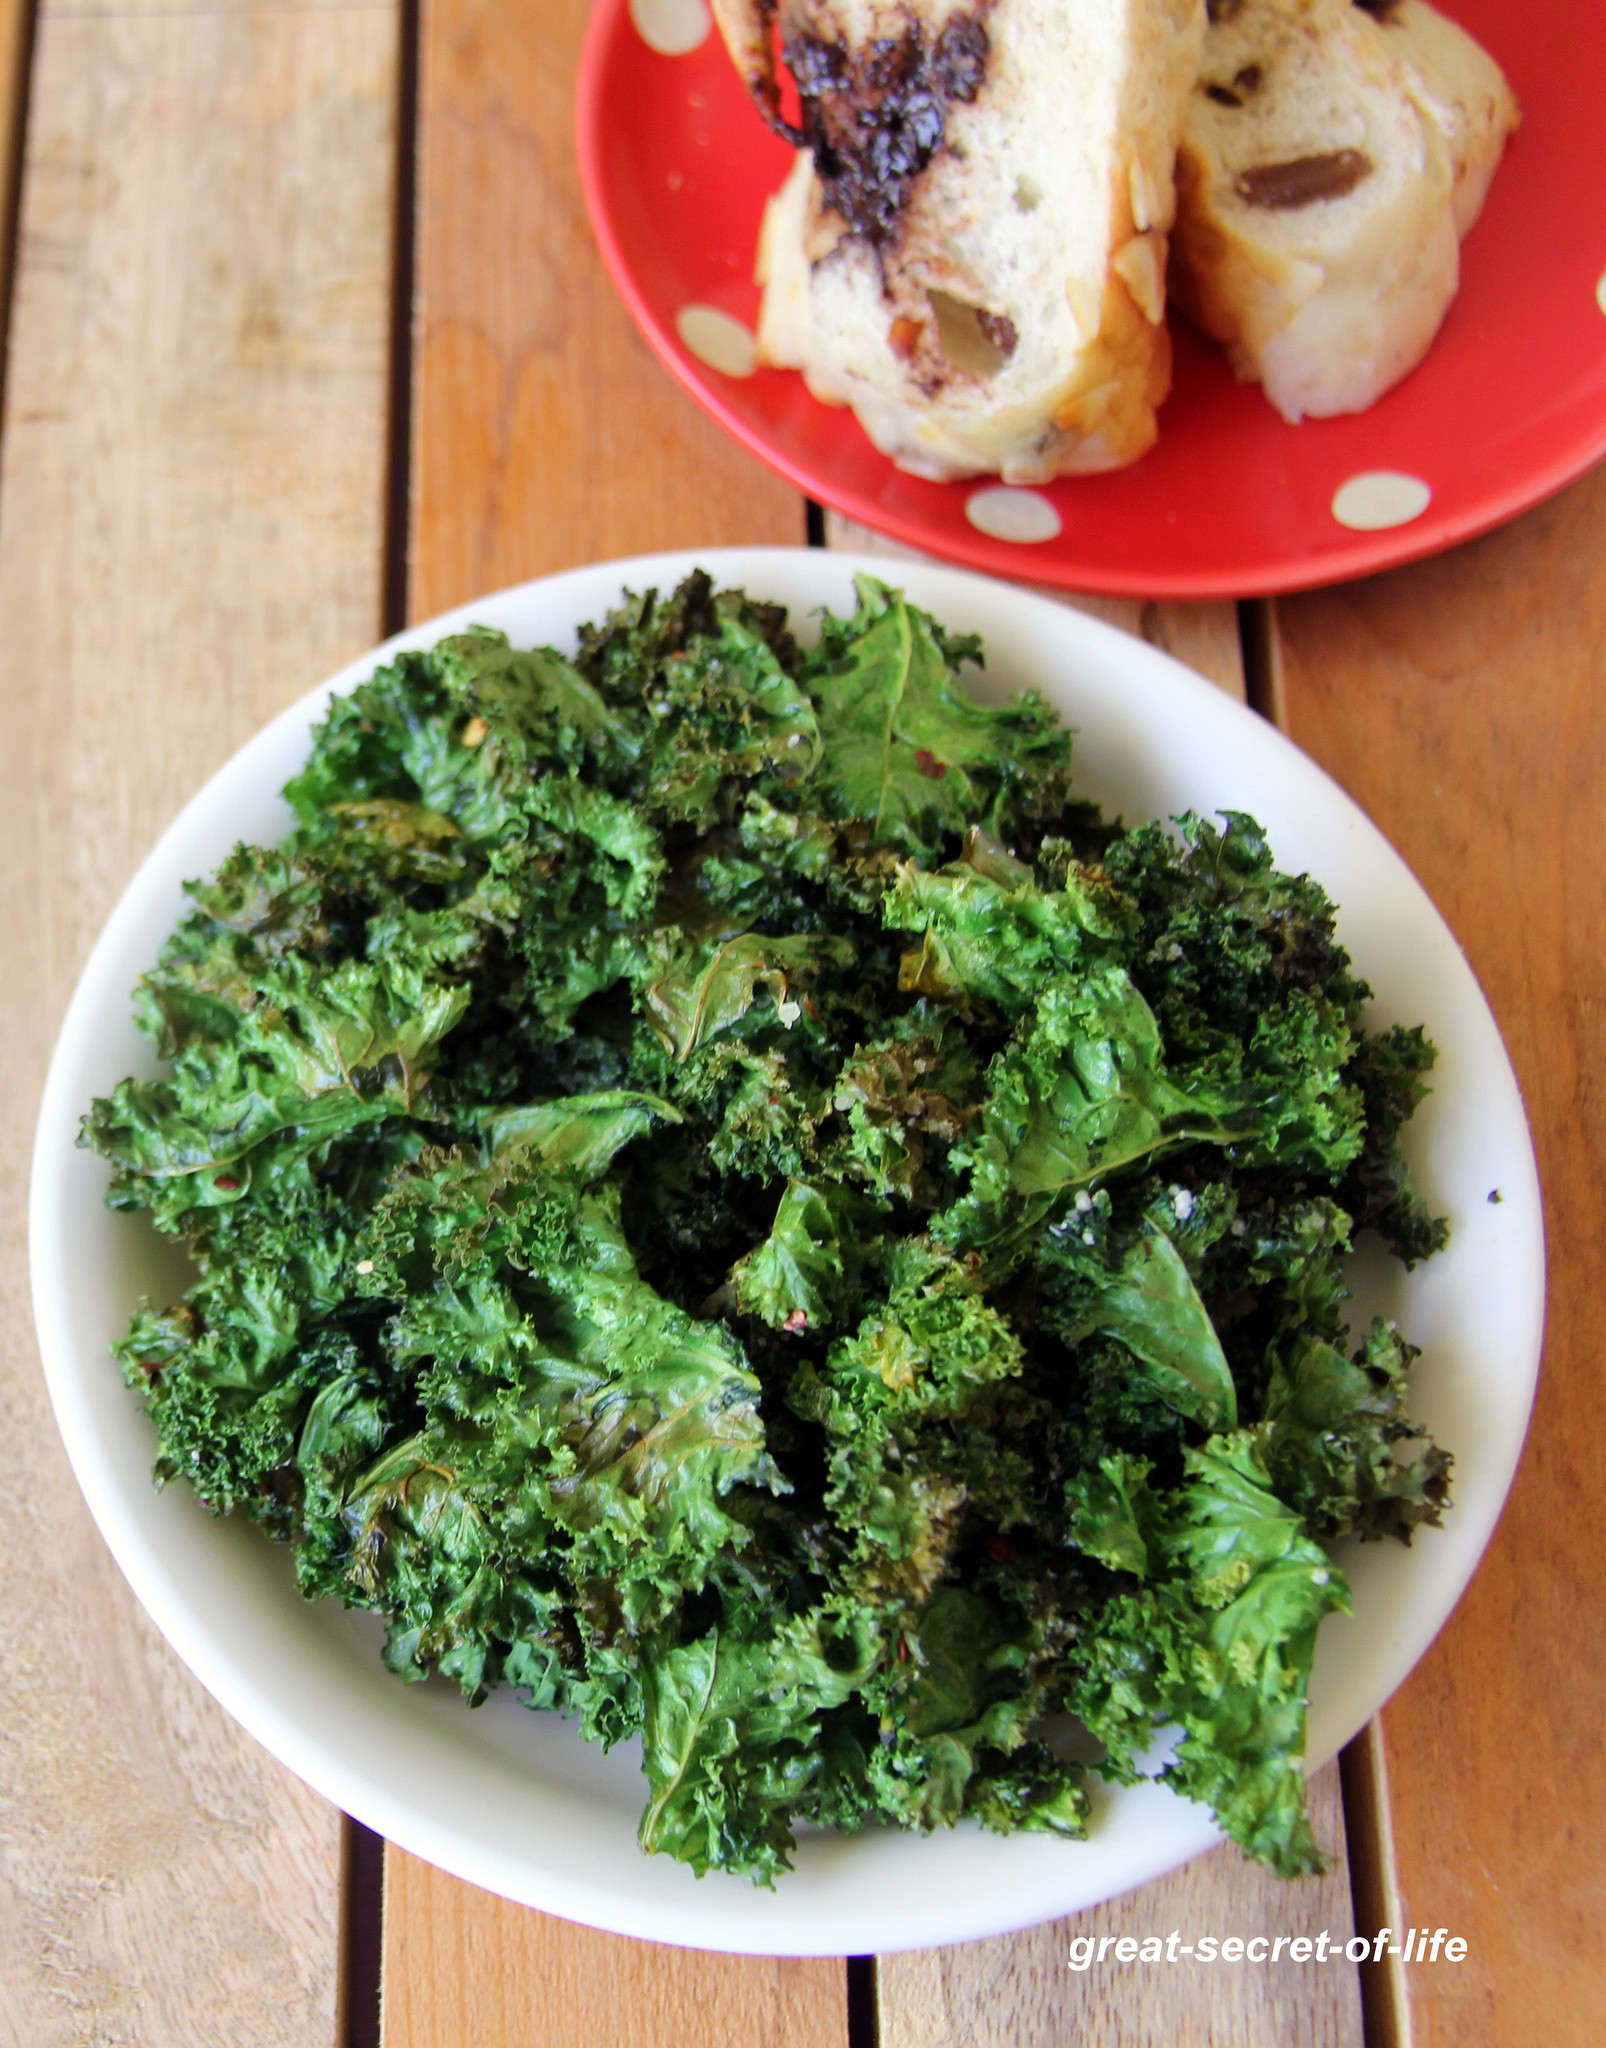 Kale Recipes Easy Healthy  Kale Crisps Simple snack recipe Kale recipes Healthy